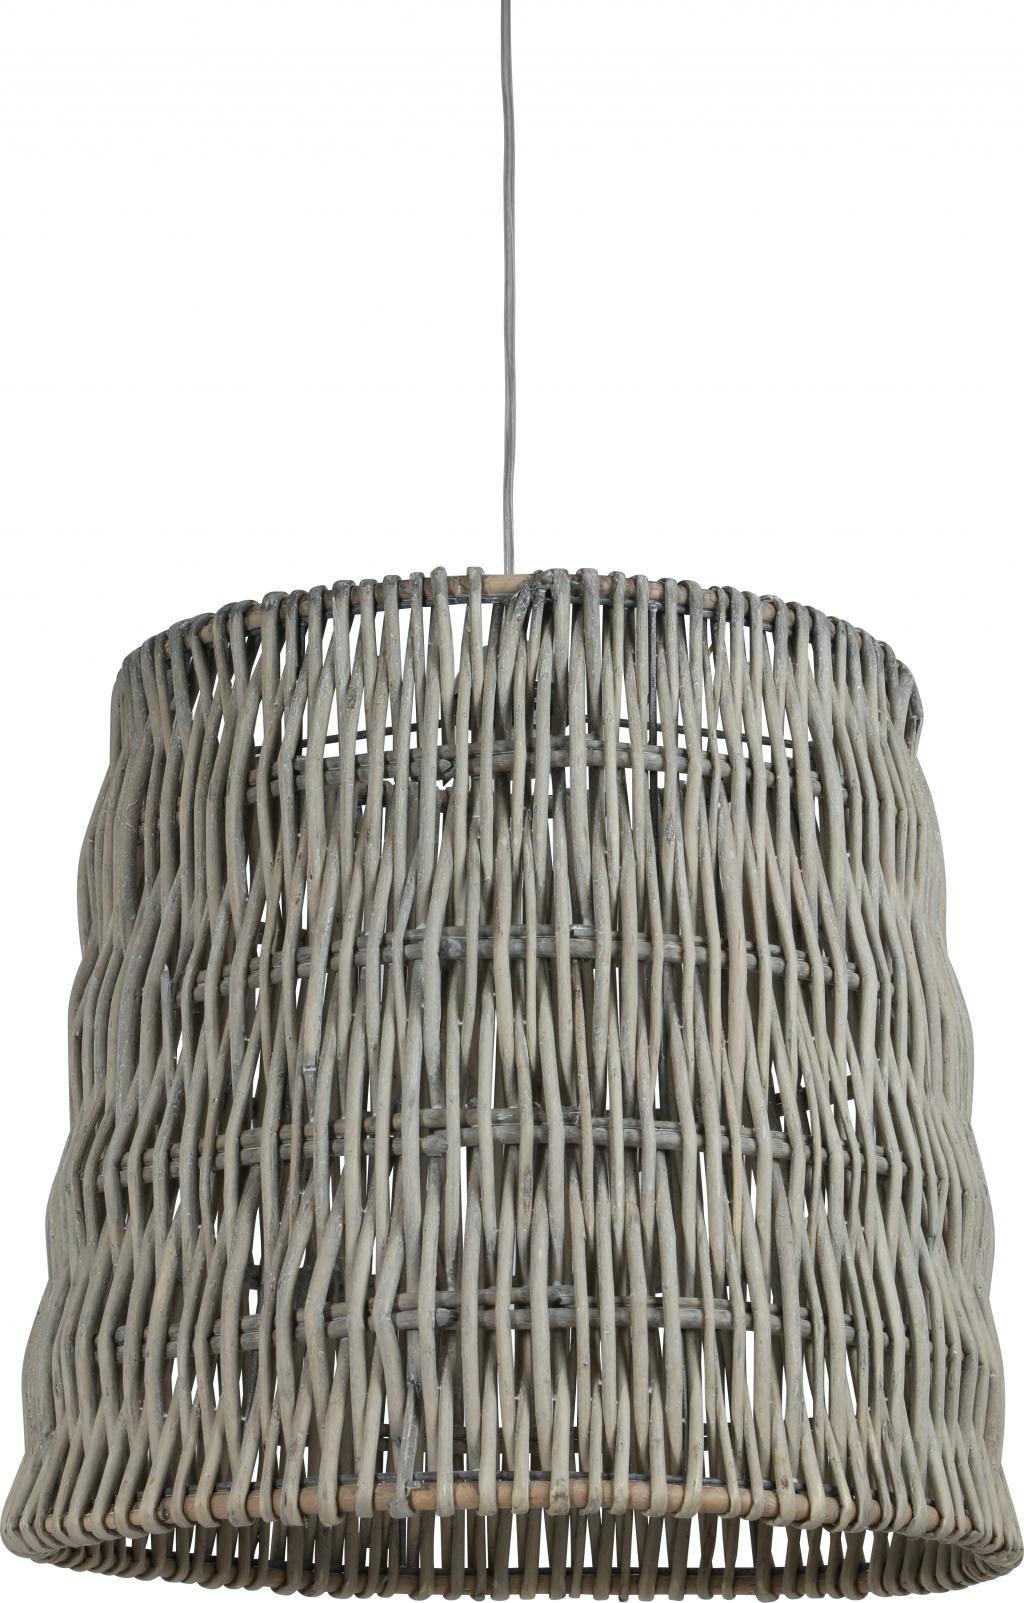 hanglamp-rotan---drum---vertical-weaving---grijs---recht---light-and-living[2].jpg